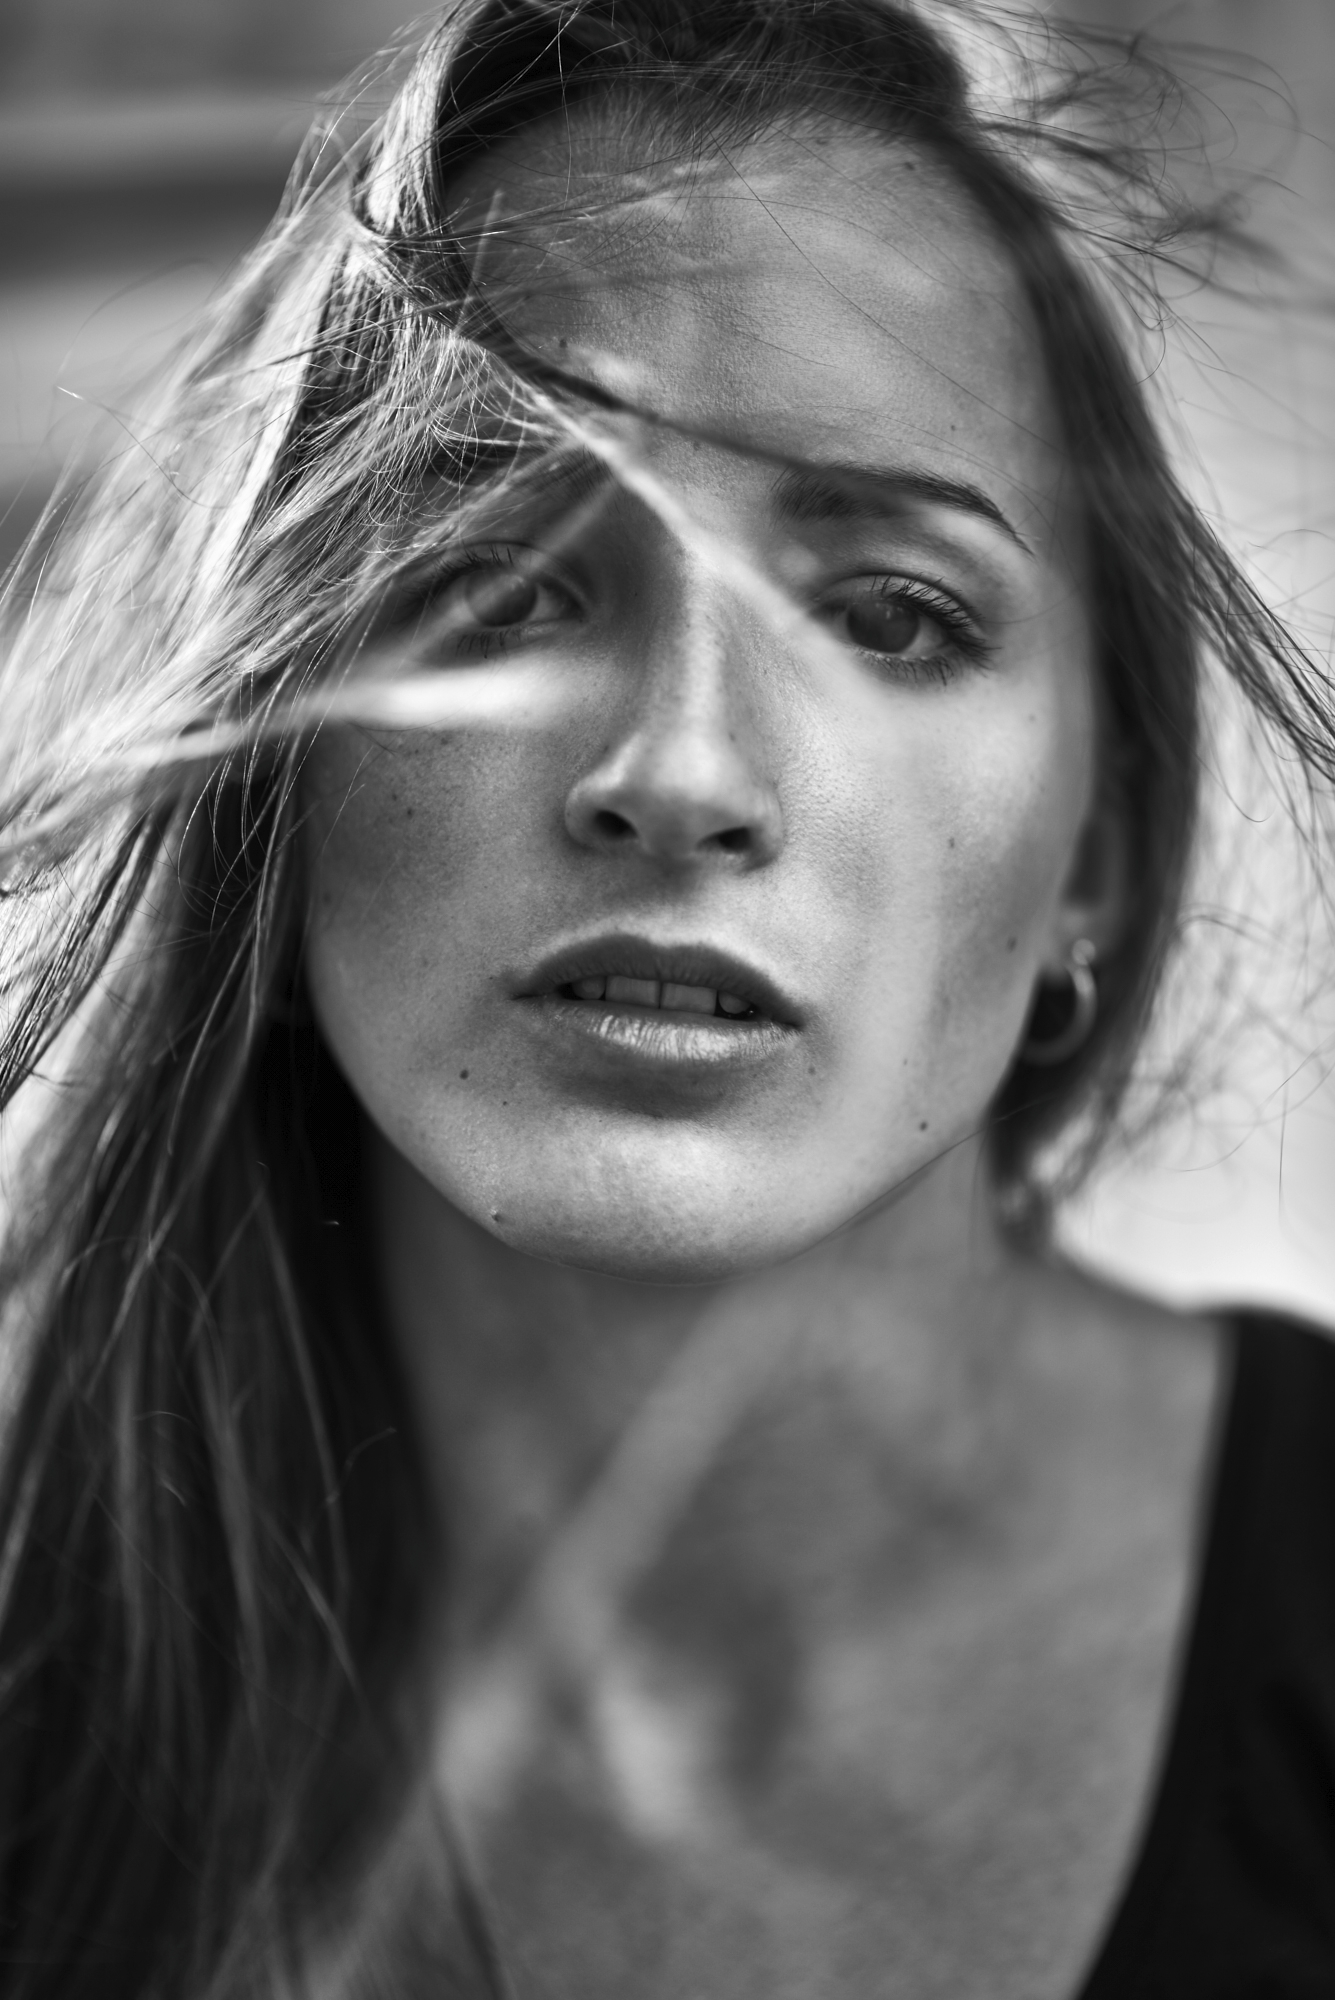 Anna / Mai 2017 - portrait, people - thomasruppel | ello